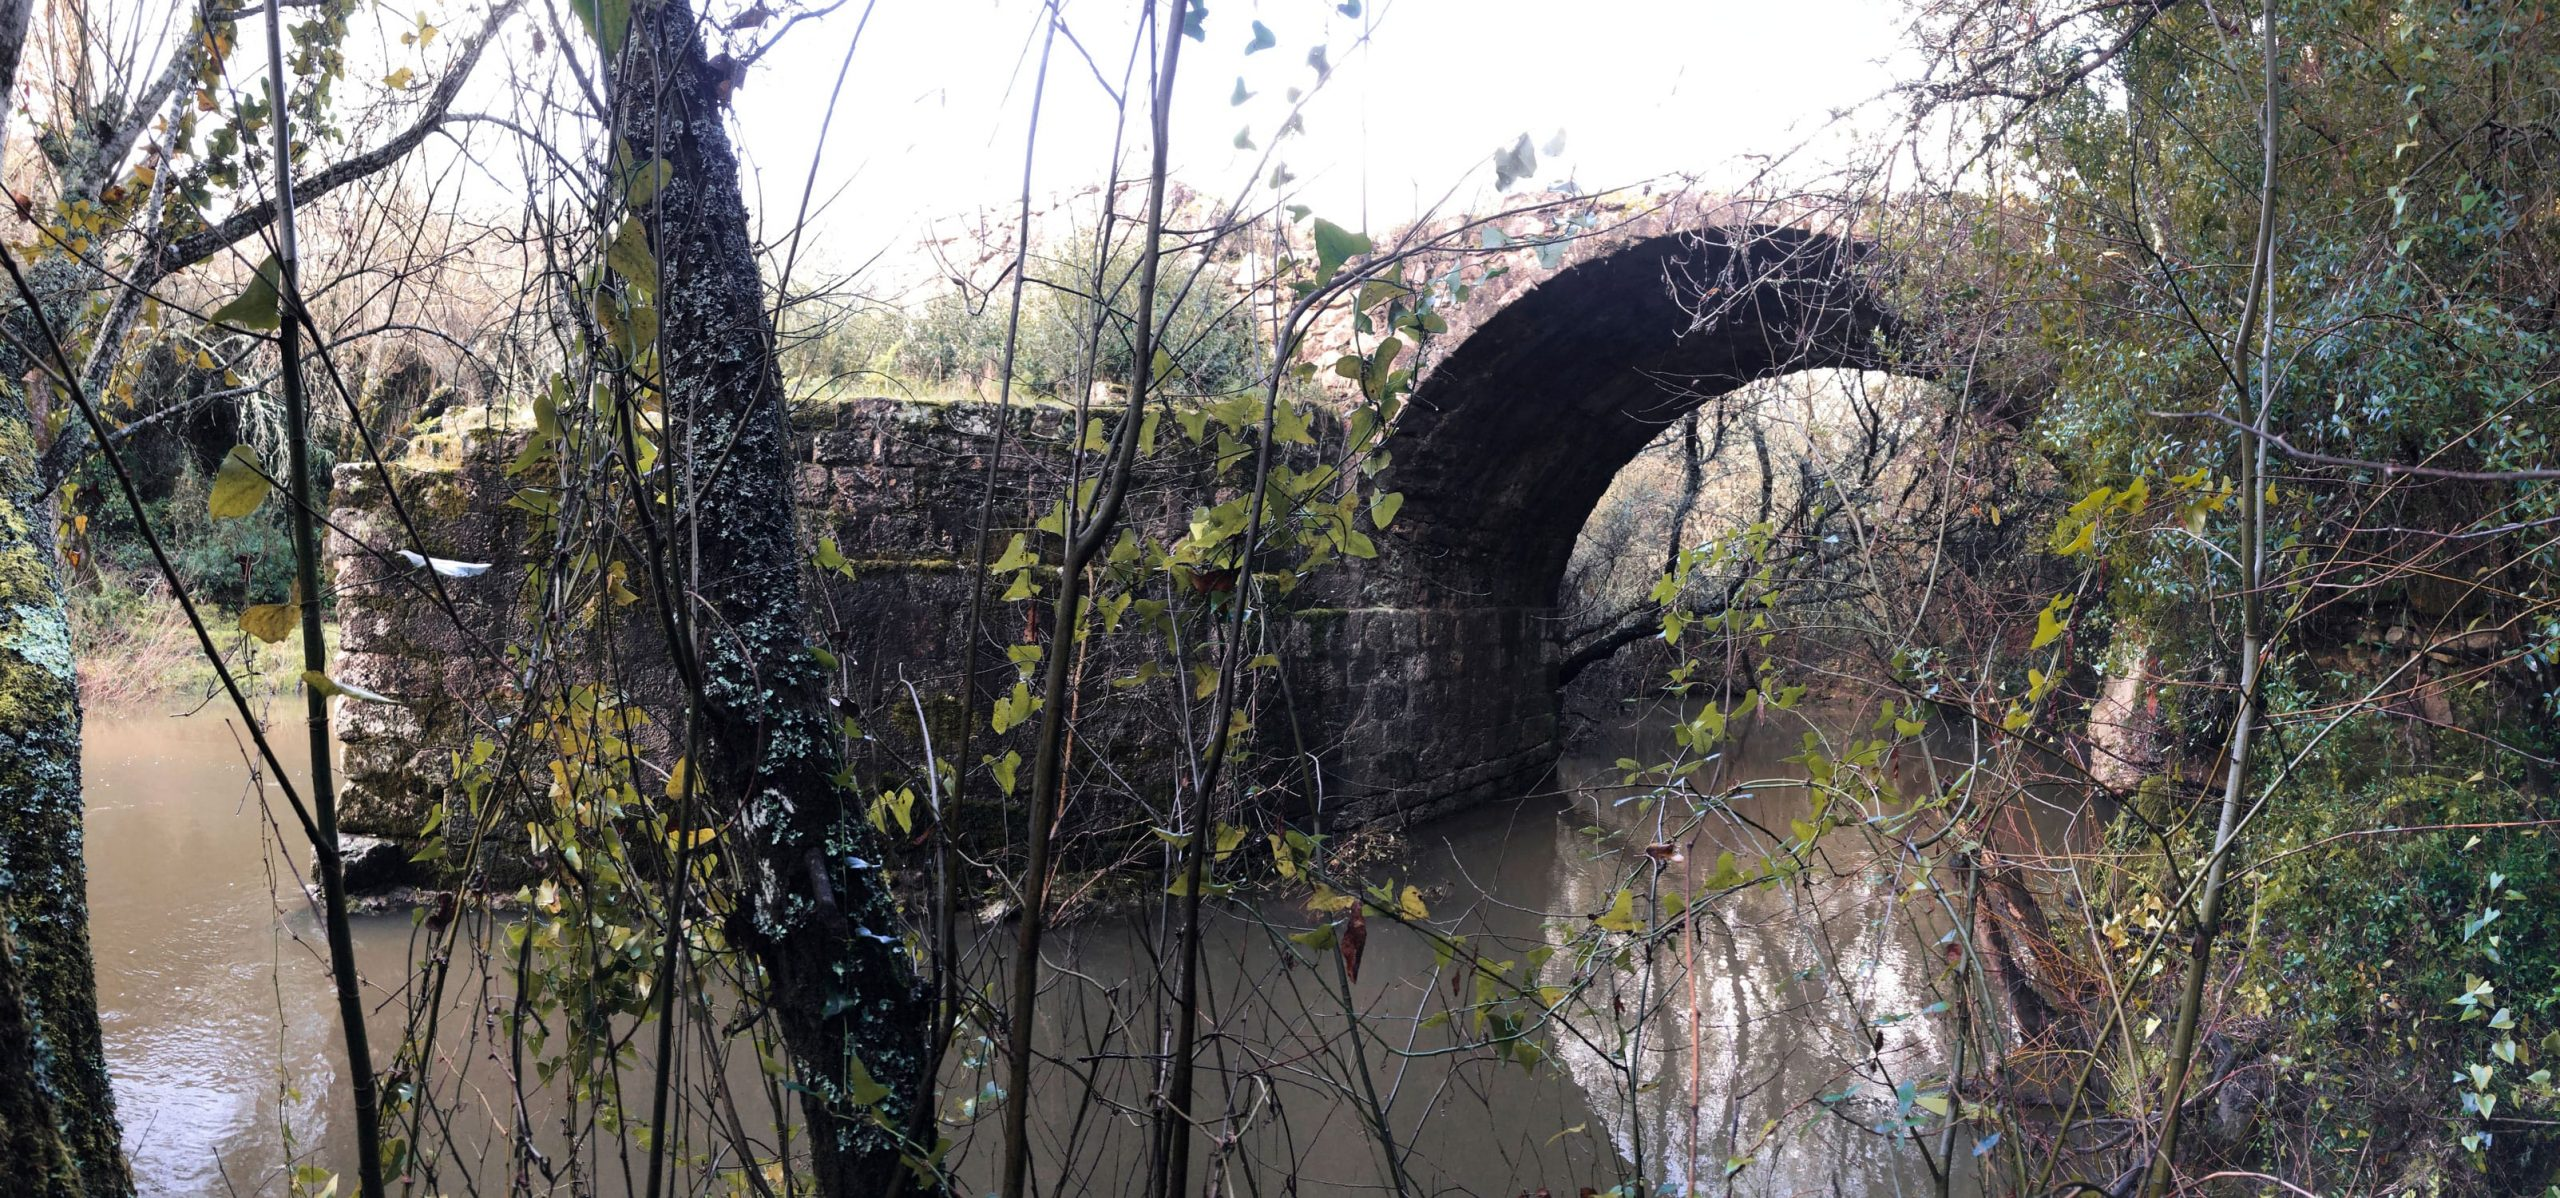 Ruínas da Ponte Cava (CMMN, 2019)